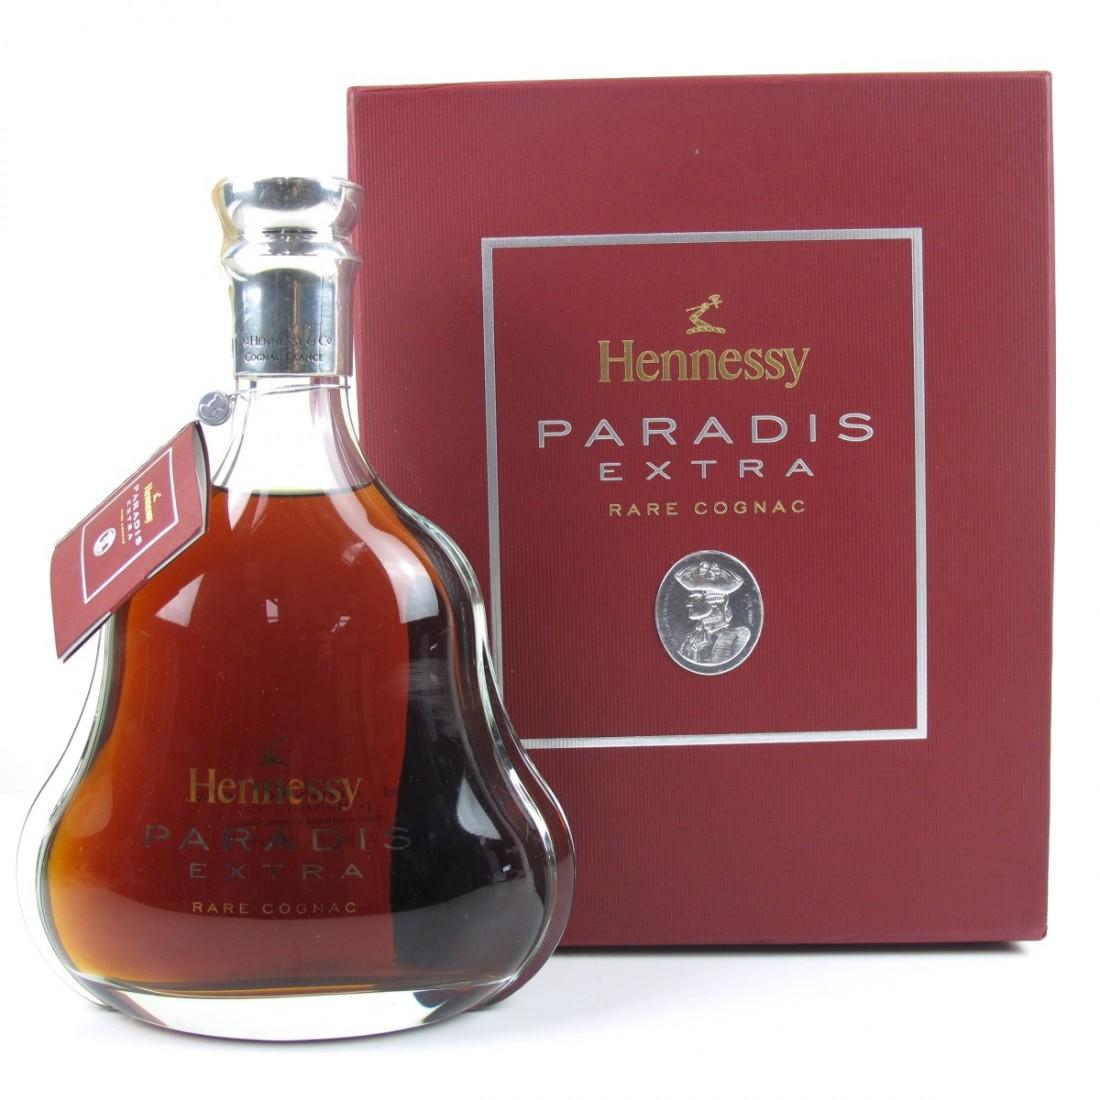 Hennessy Paradis Extra Cognac